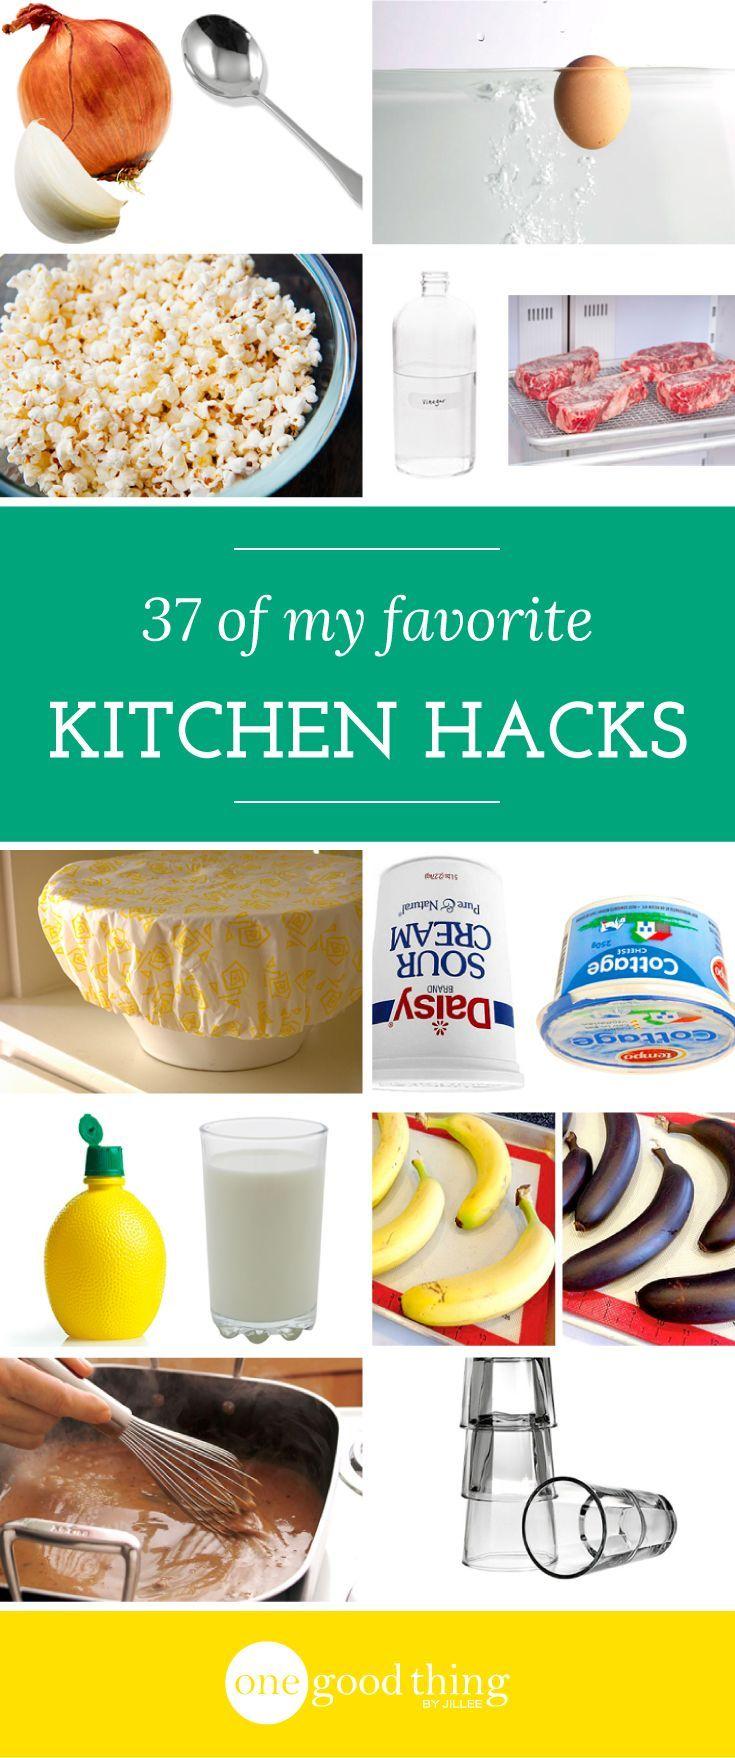 1099 best Desserts & Tips images on Pinterest | Petit fours, Baking ...